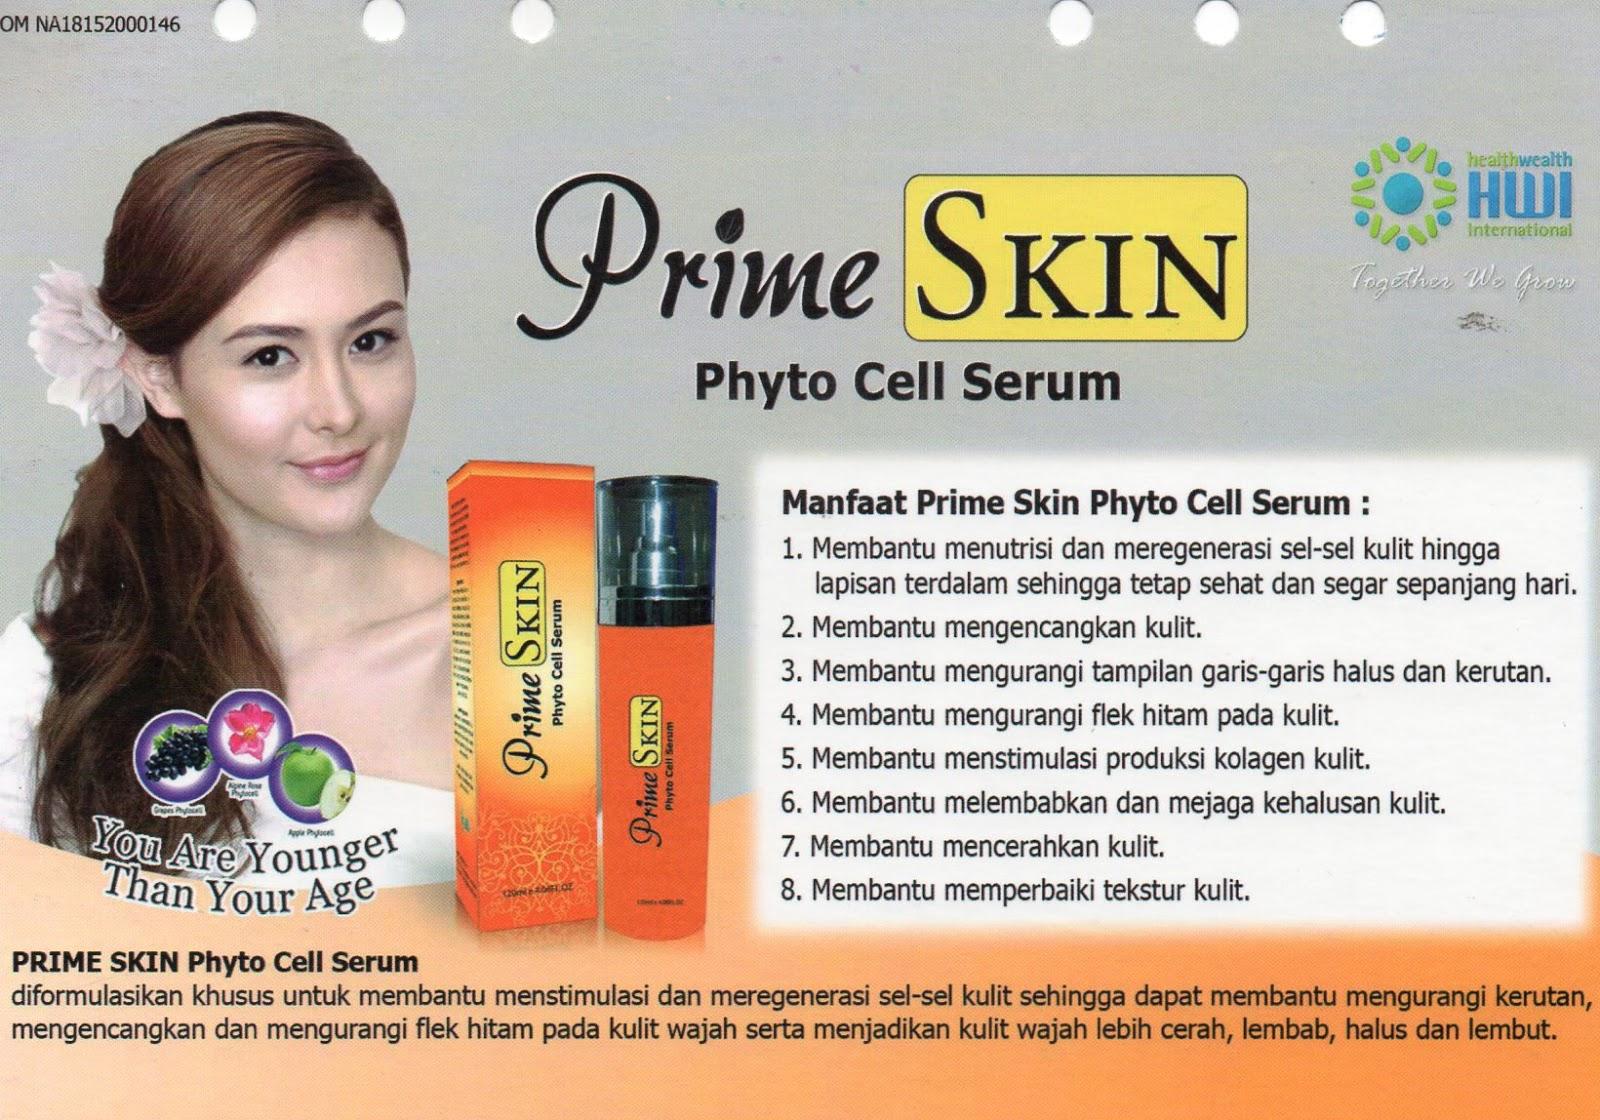 Agen HWI Cikarang: Prime Skin Phyto Cell Serum